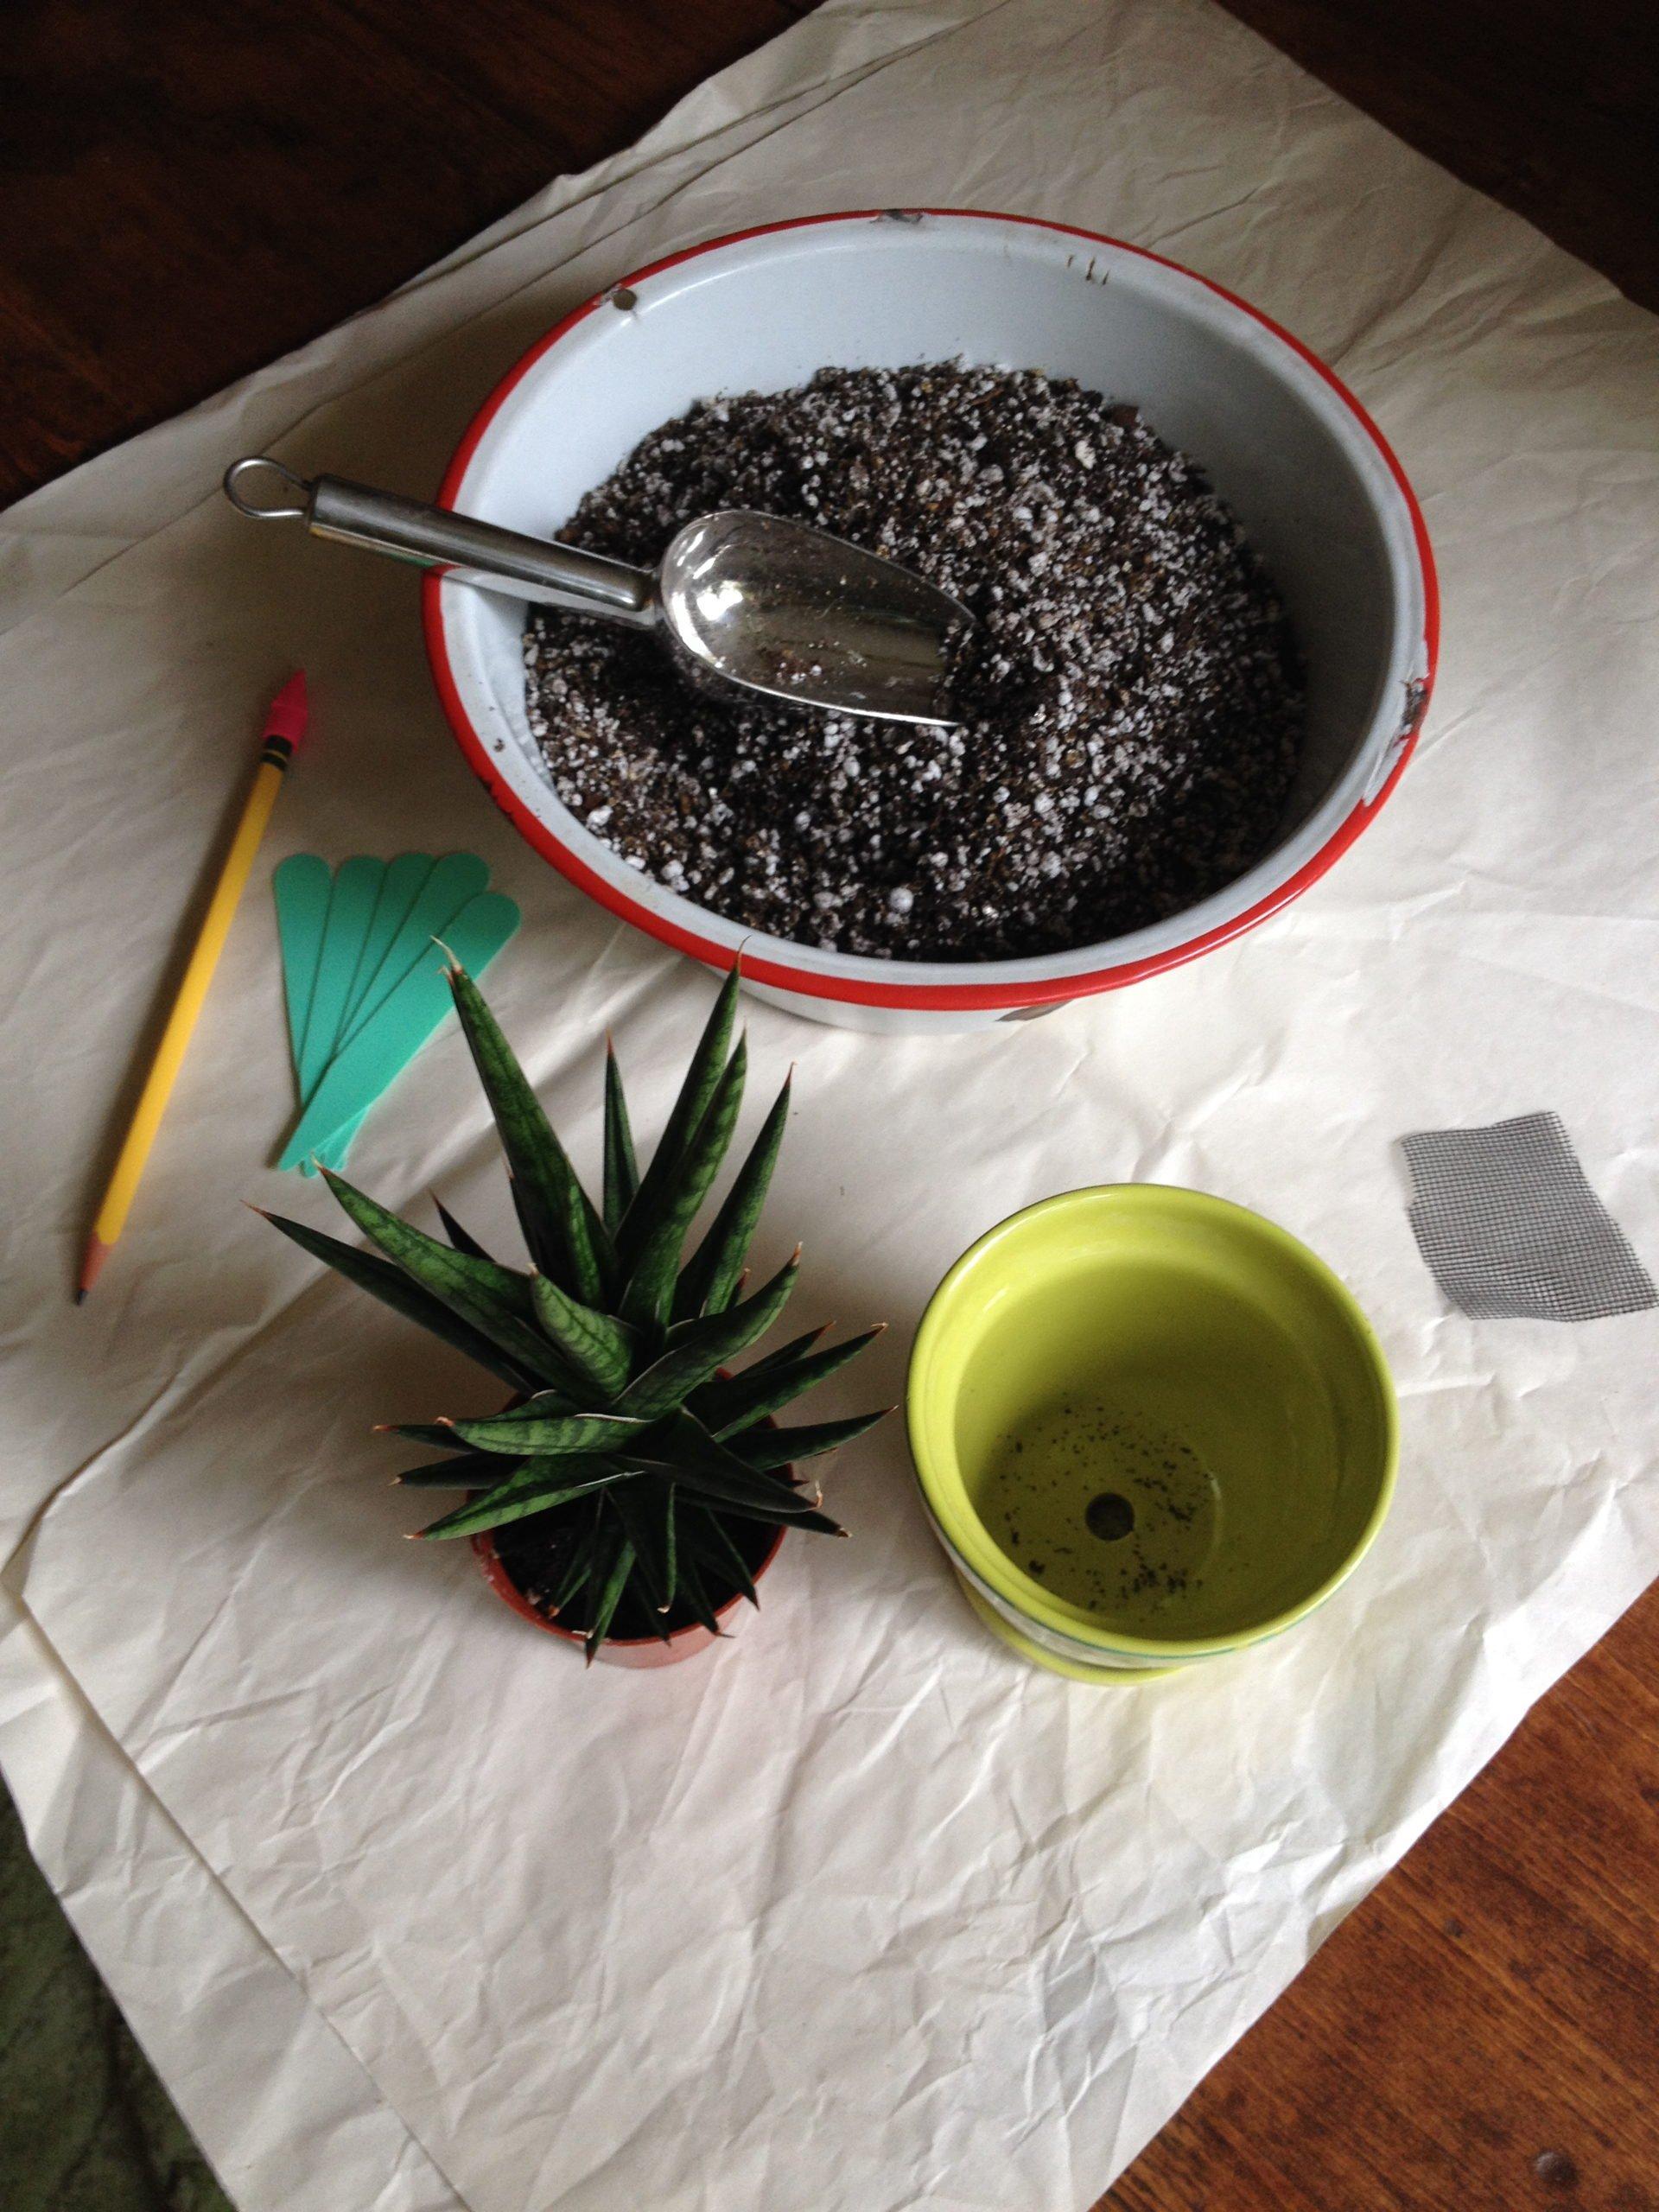 Repotting supplies